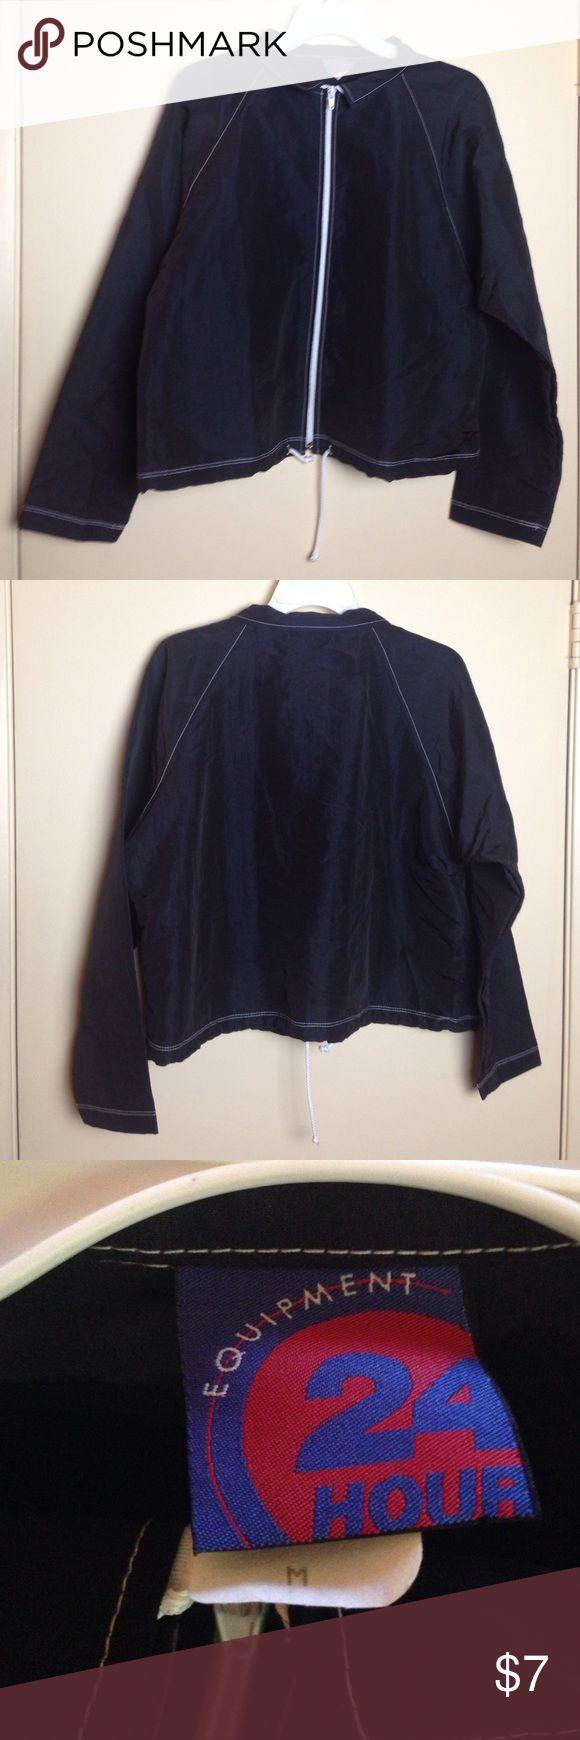 Beautiful 24 Hr FITNESS Equipment Jacket Excellent Beautiful 24 Hr FITNESS Equipment Jacket Size M Very Cute 24 hr Fitness Equipment Jackets & Coats Lightweight & Shirt Jackets